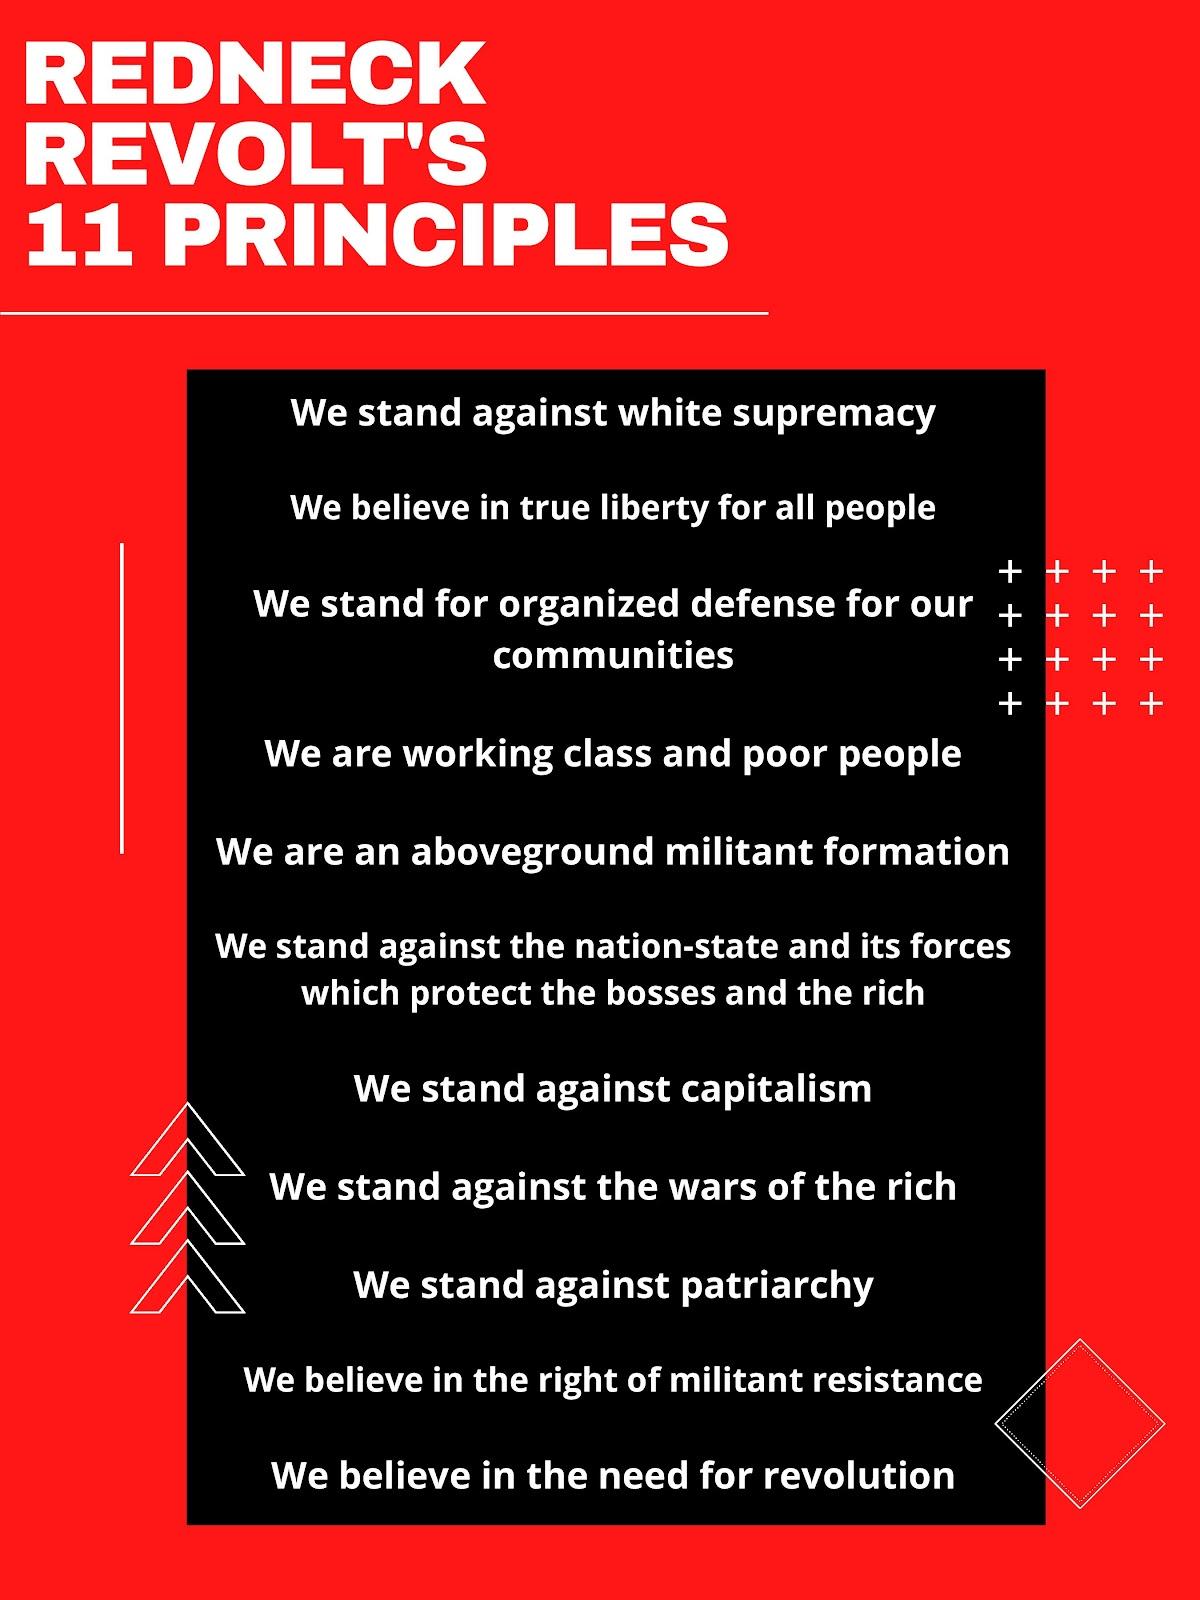 Redneck Revolt's 11 principles